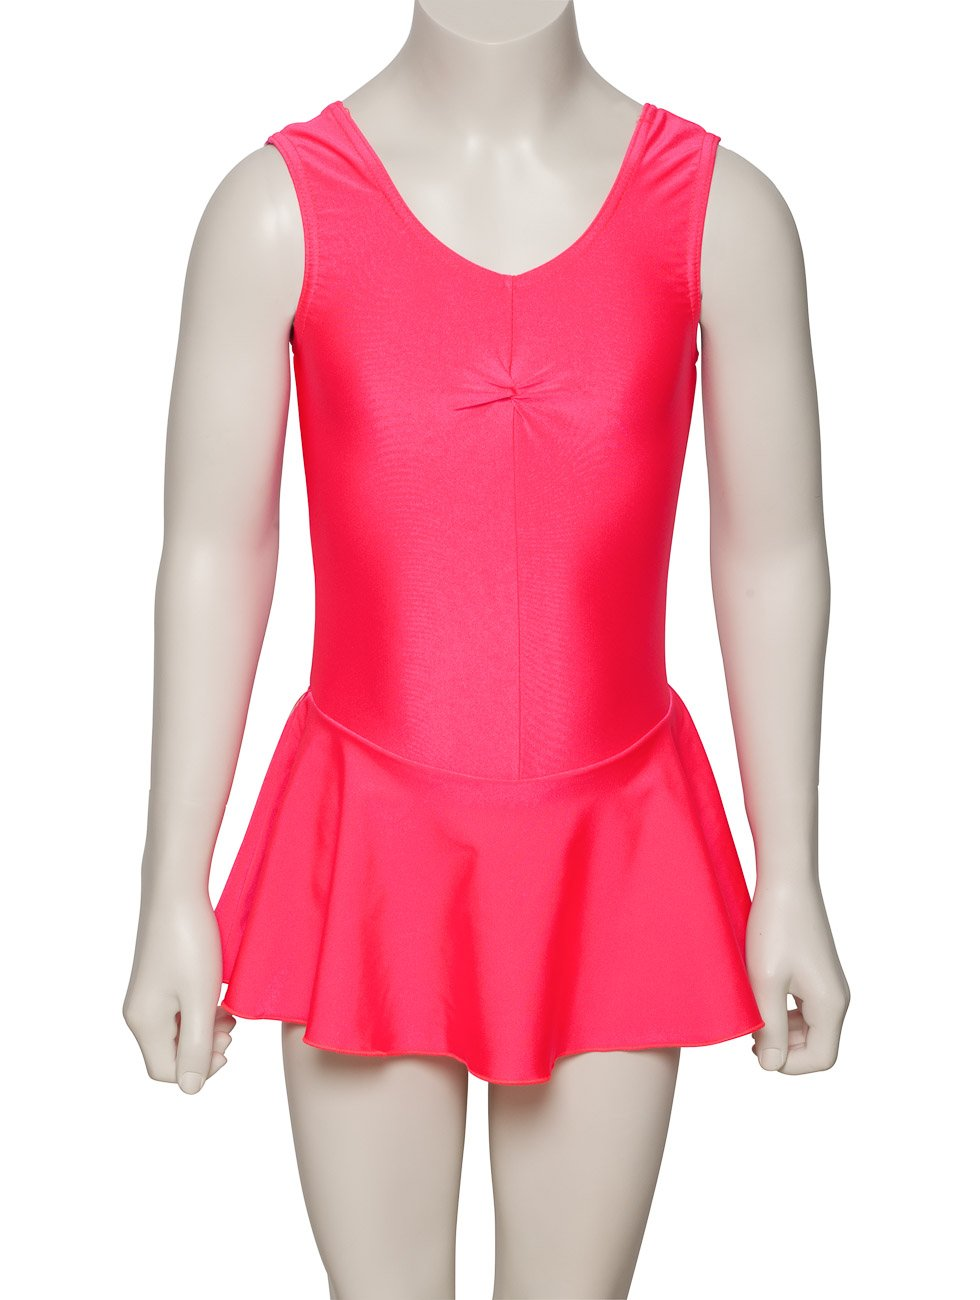 KDR005 Girls Coral Lycra Ballet Dance Gym Leotard With Skirt Outfit By Katz Dancewear